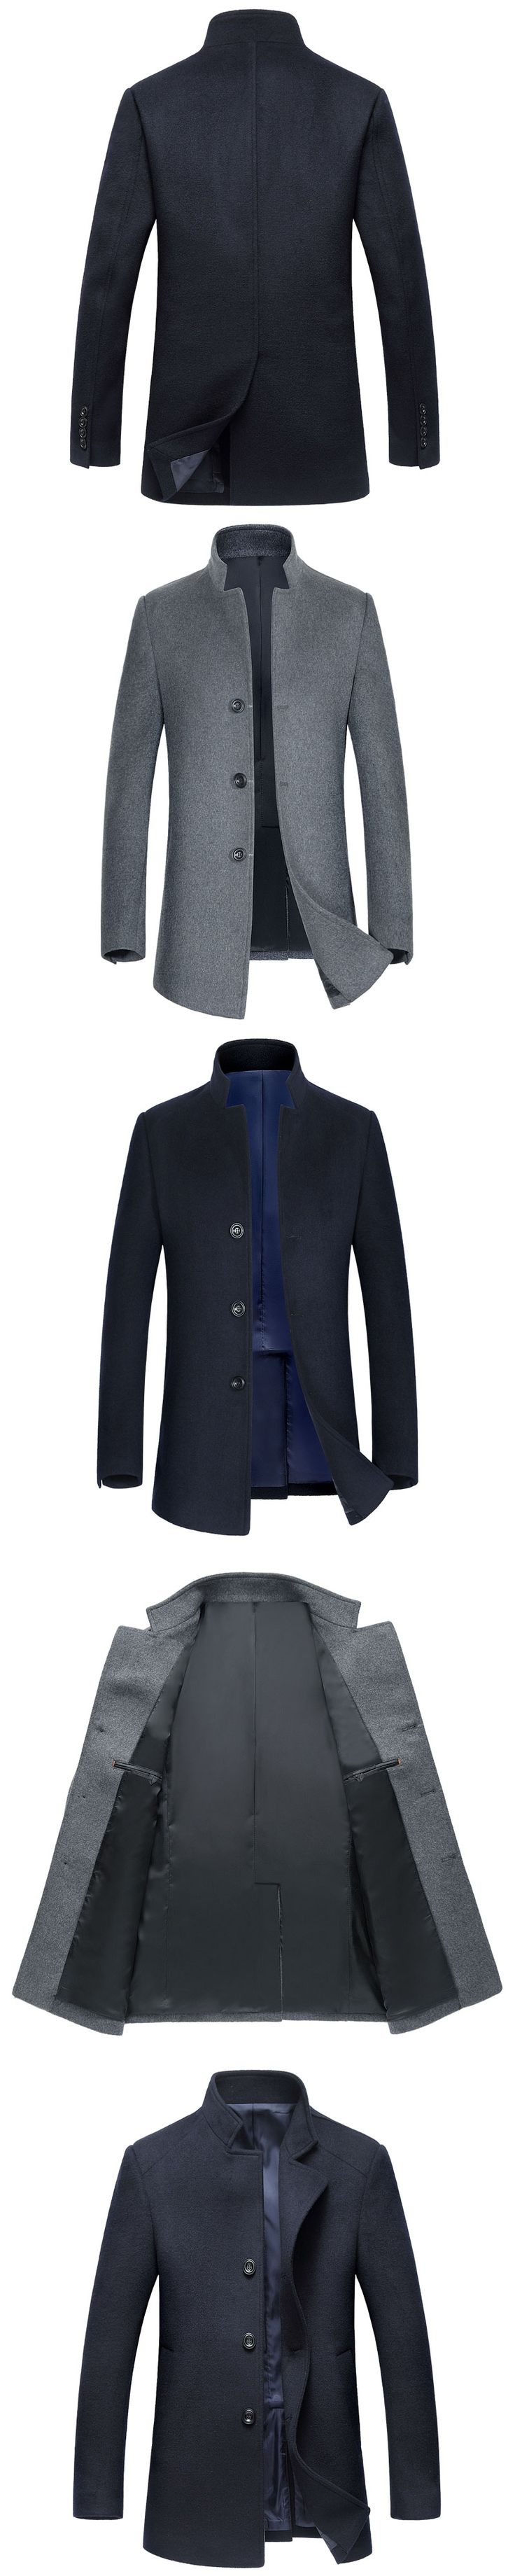 2017 New Men Winter Pattern Leisure Fashion Male Mandarin Collar Jacket Blend Wool Coat Cotton Luxury Long Sleeve Free Shipping